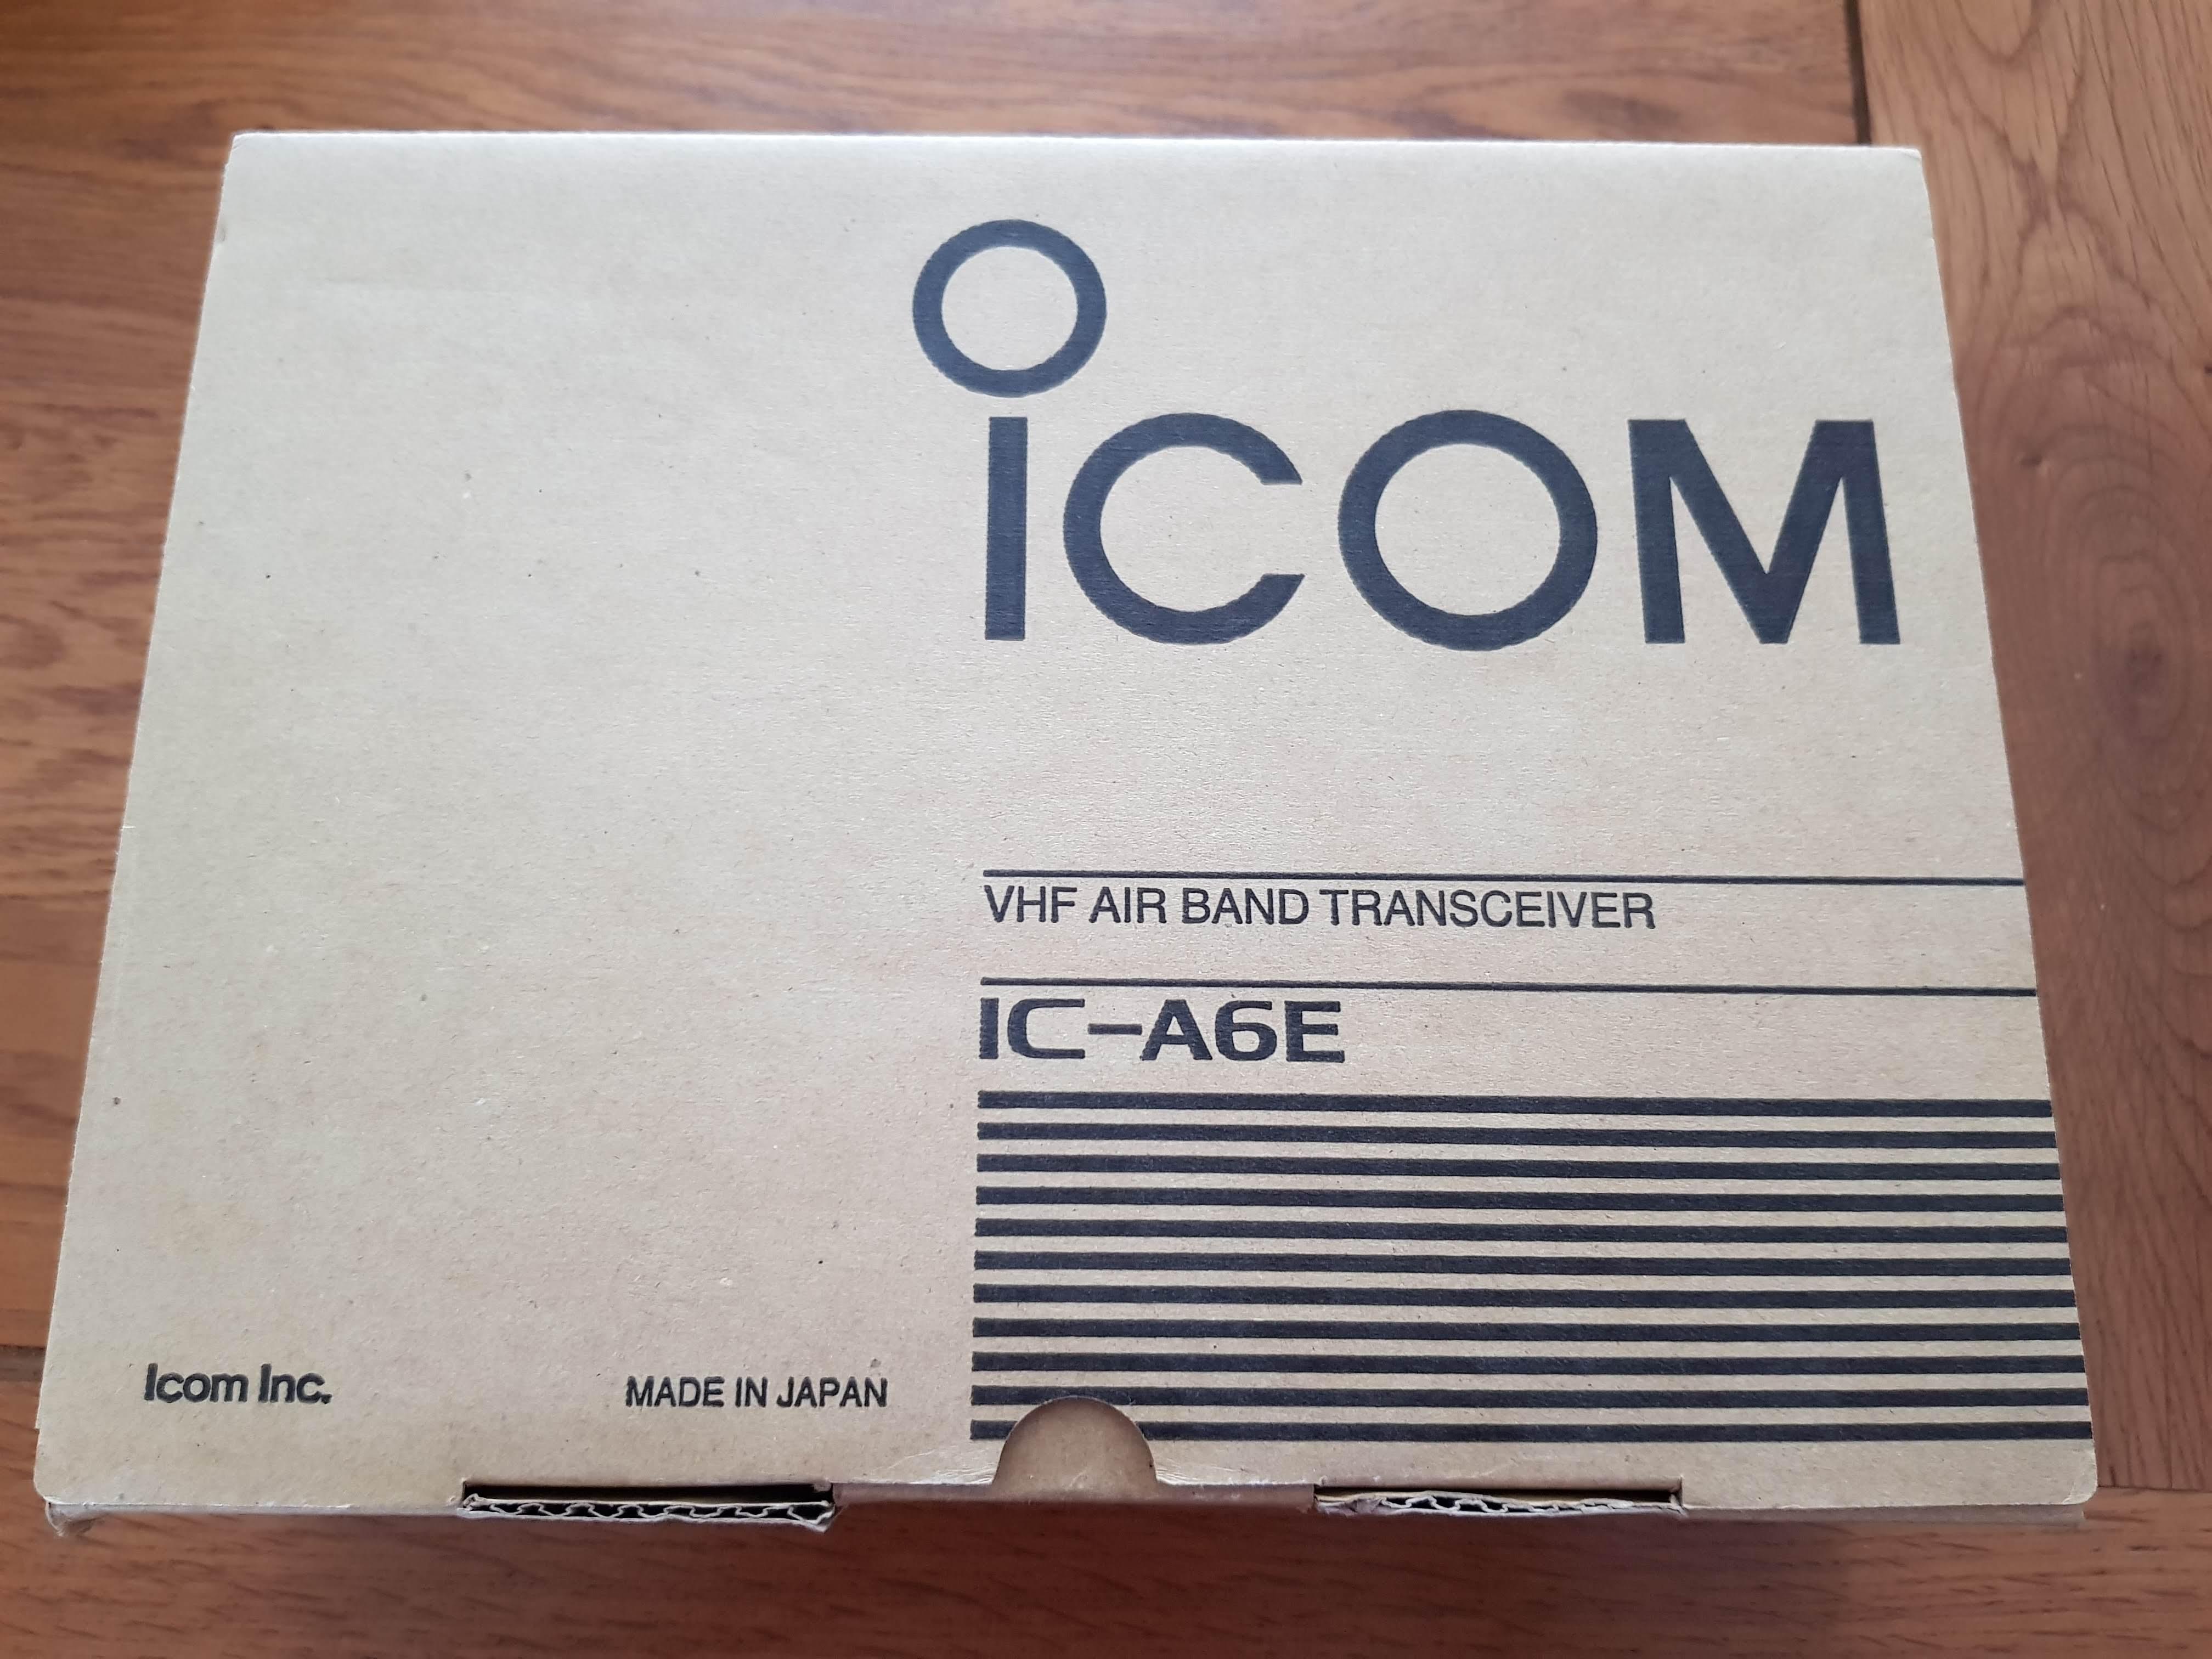 Icom IC-A6E - Transmitter receiver VHF Air Band Radio